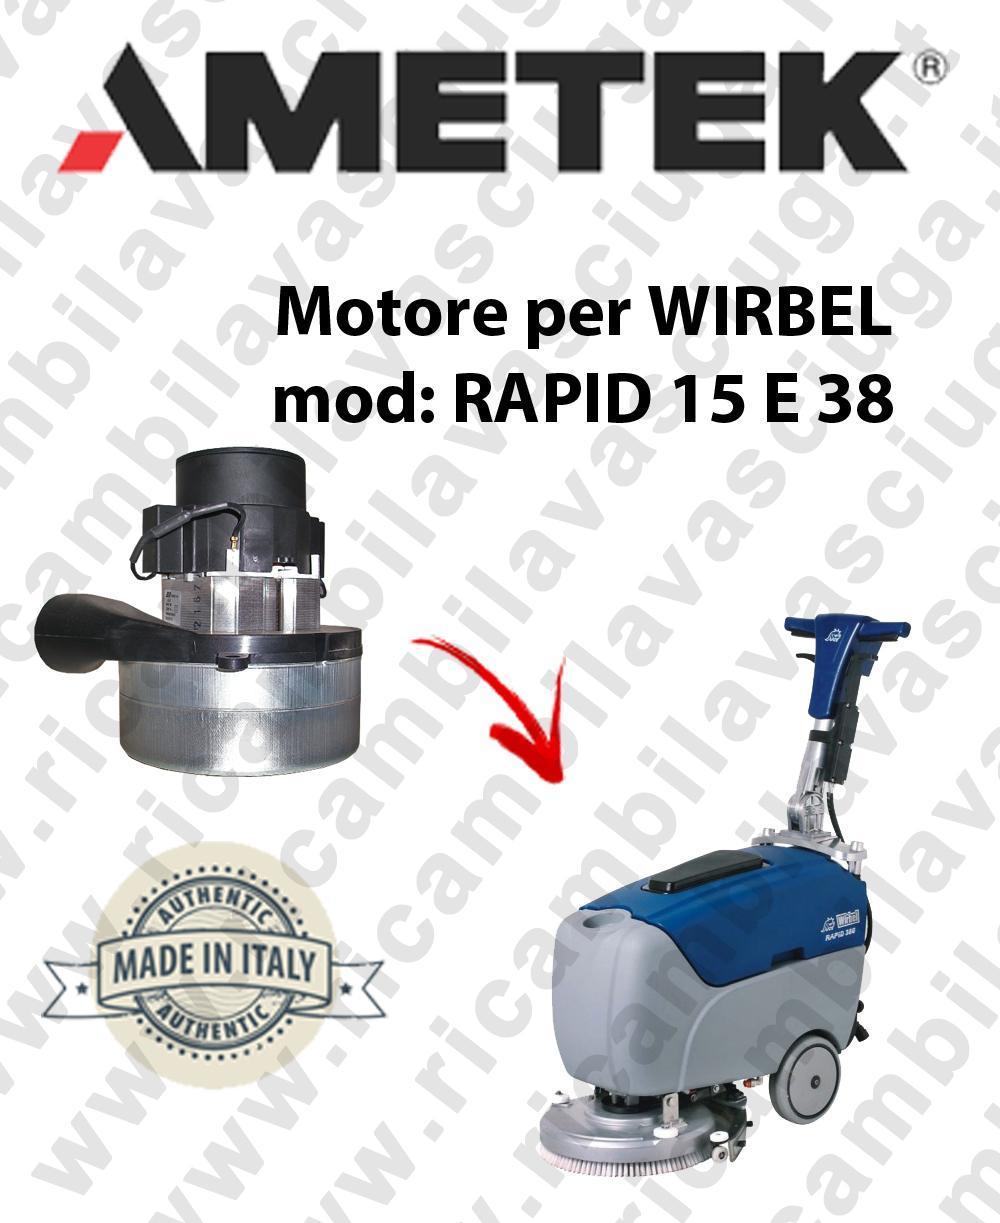 RAPID 15 ünd 38 Saugmotor AMETEK für scheuersaugmaschinen WIRBEL